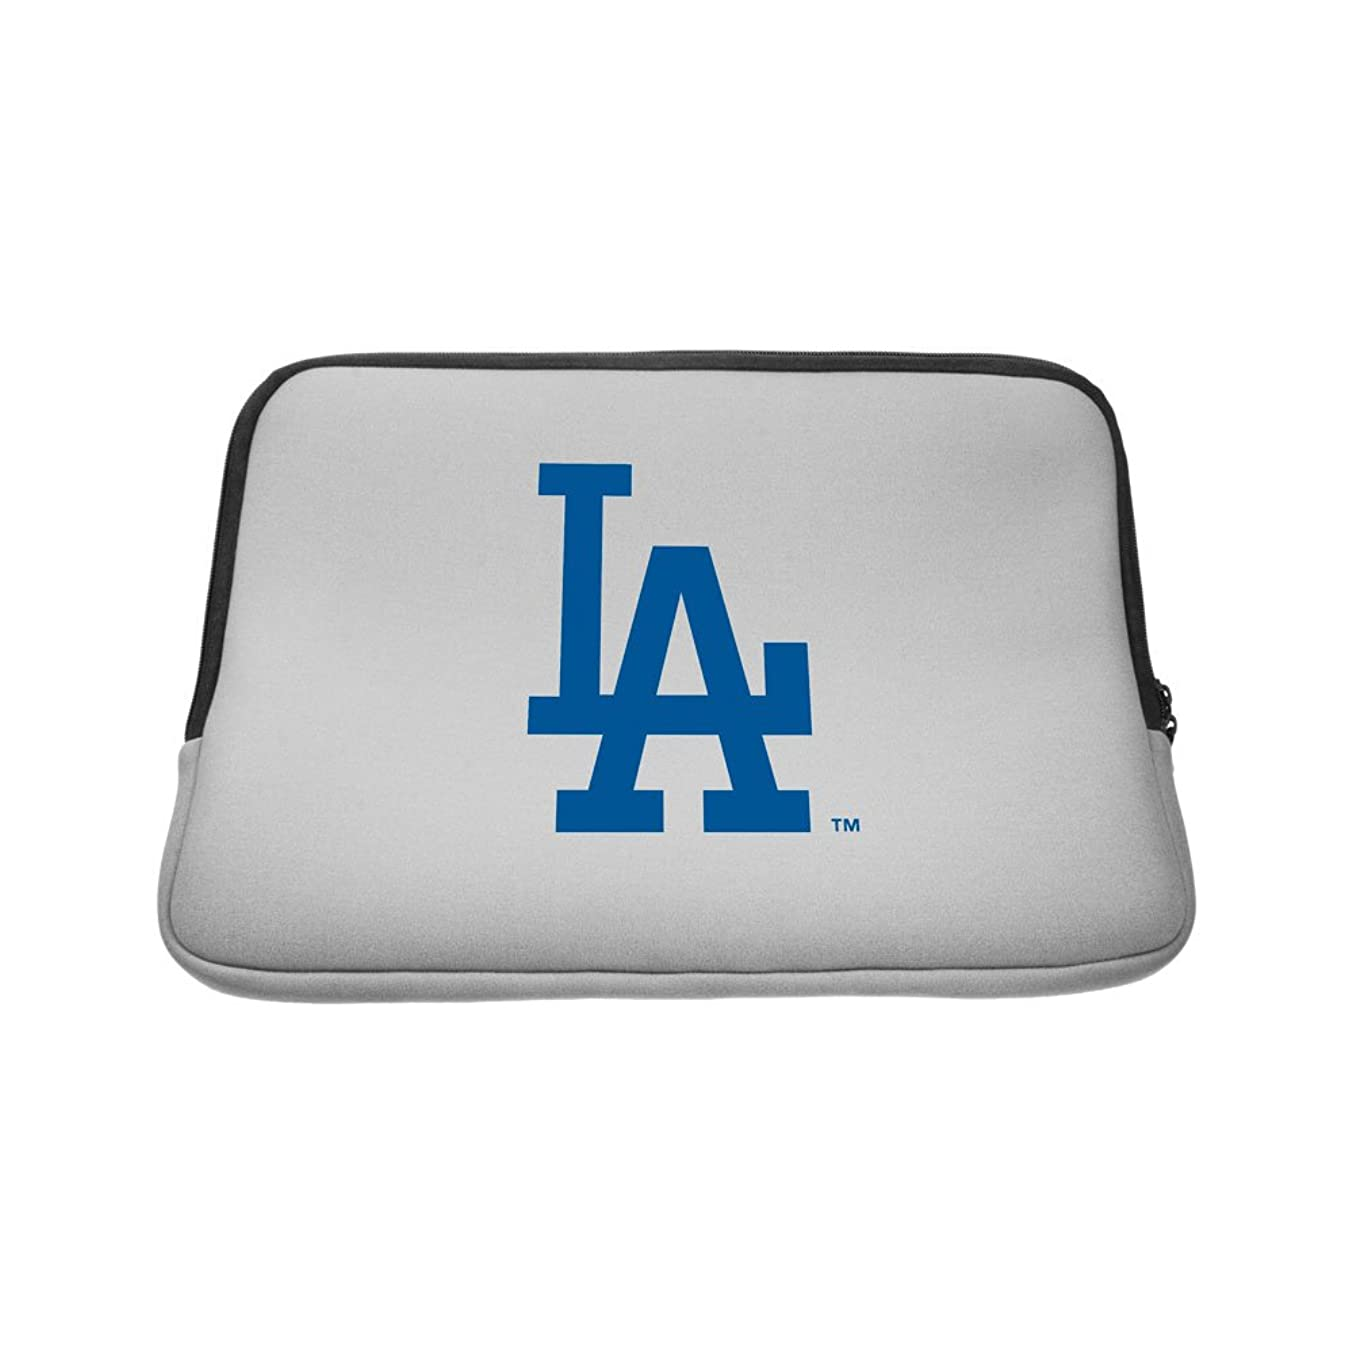 Los Angeles Dodgers MLB Laptop Sleeve 15.6 inch LTSLAD.15